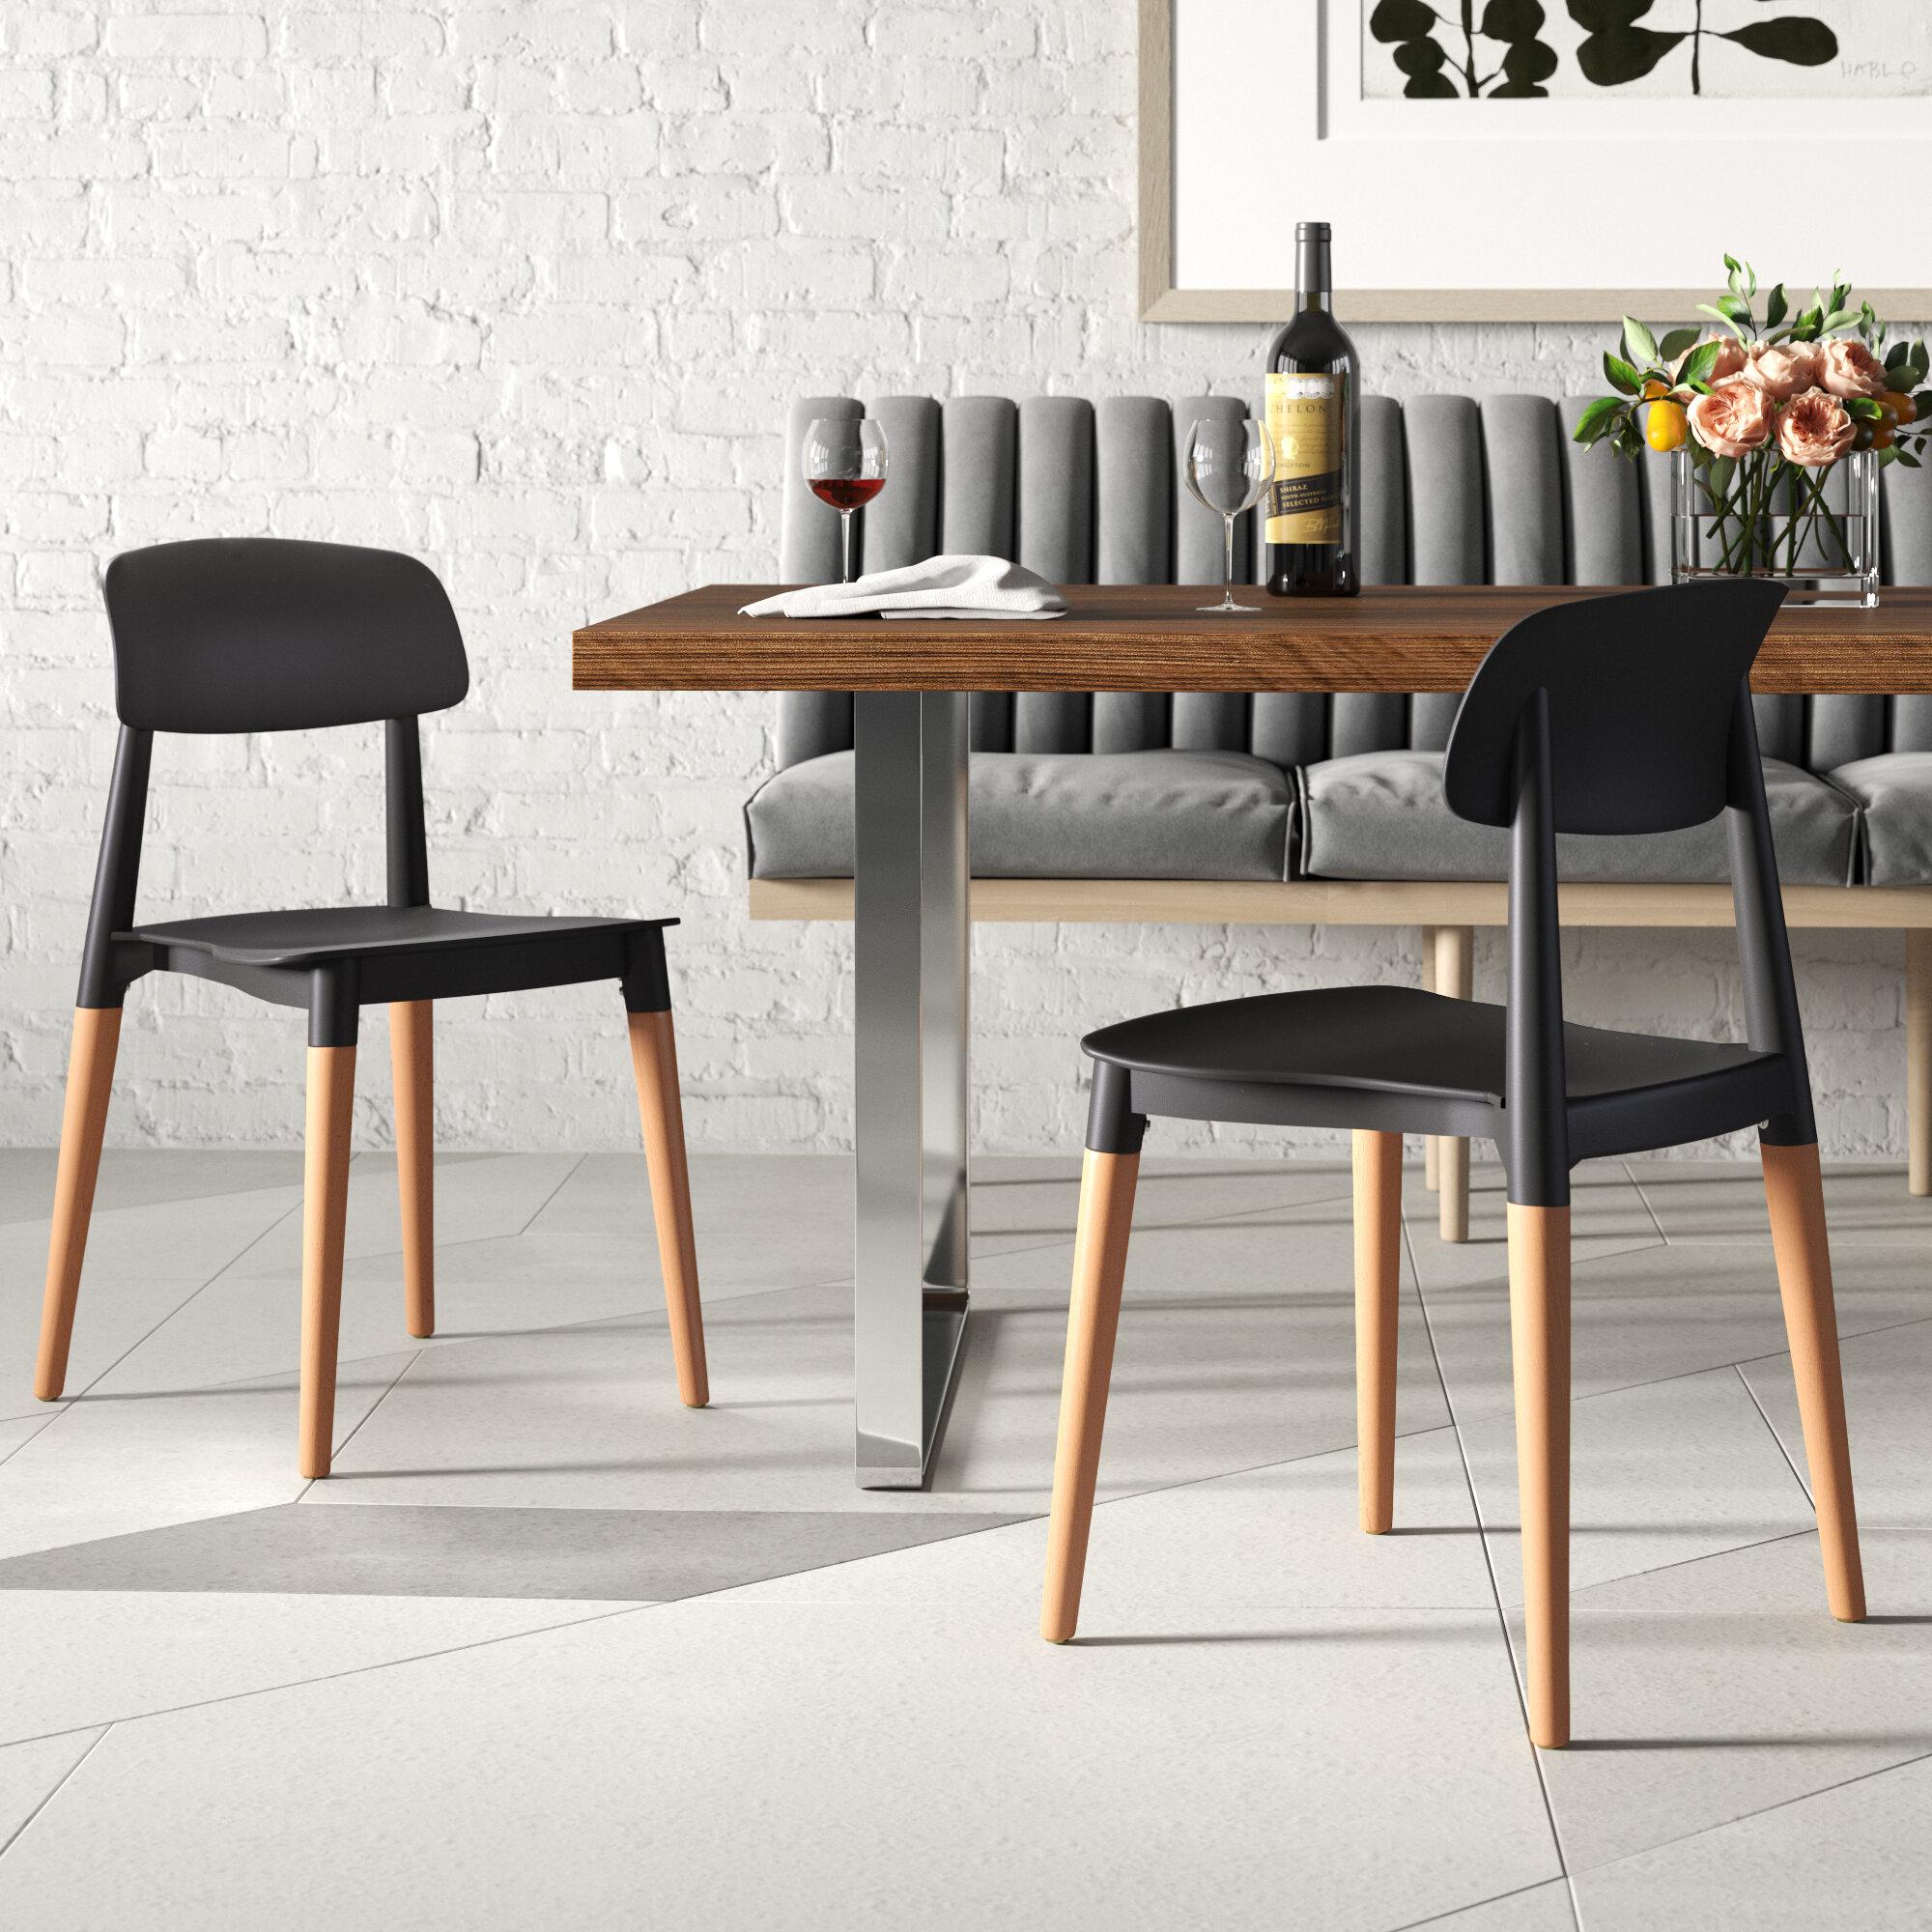 George Oliver Bakker Dining Chair Reviews Wayfair